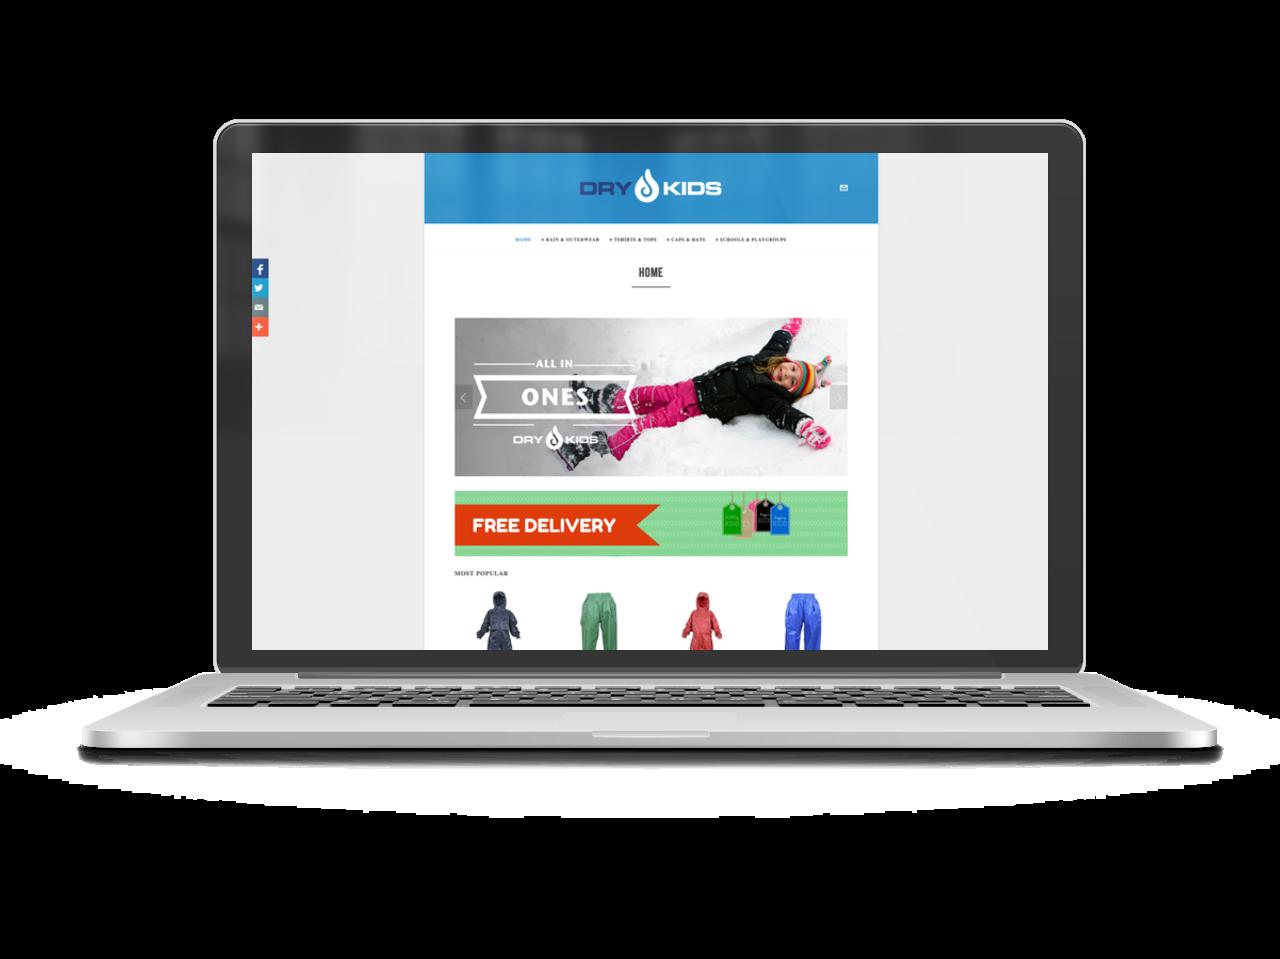 Dry Kids homepage